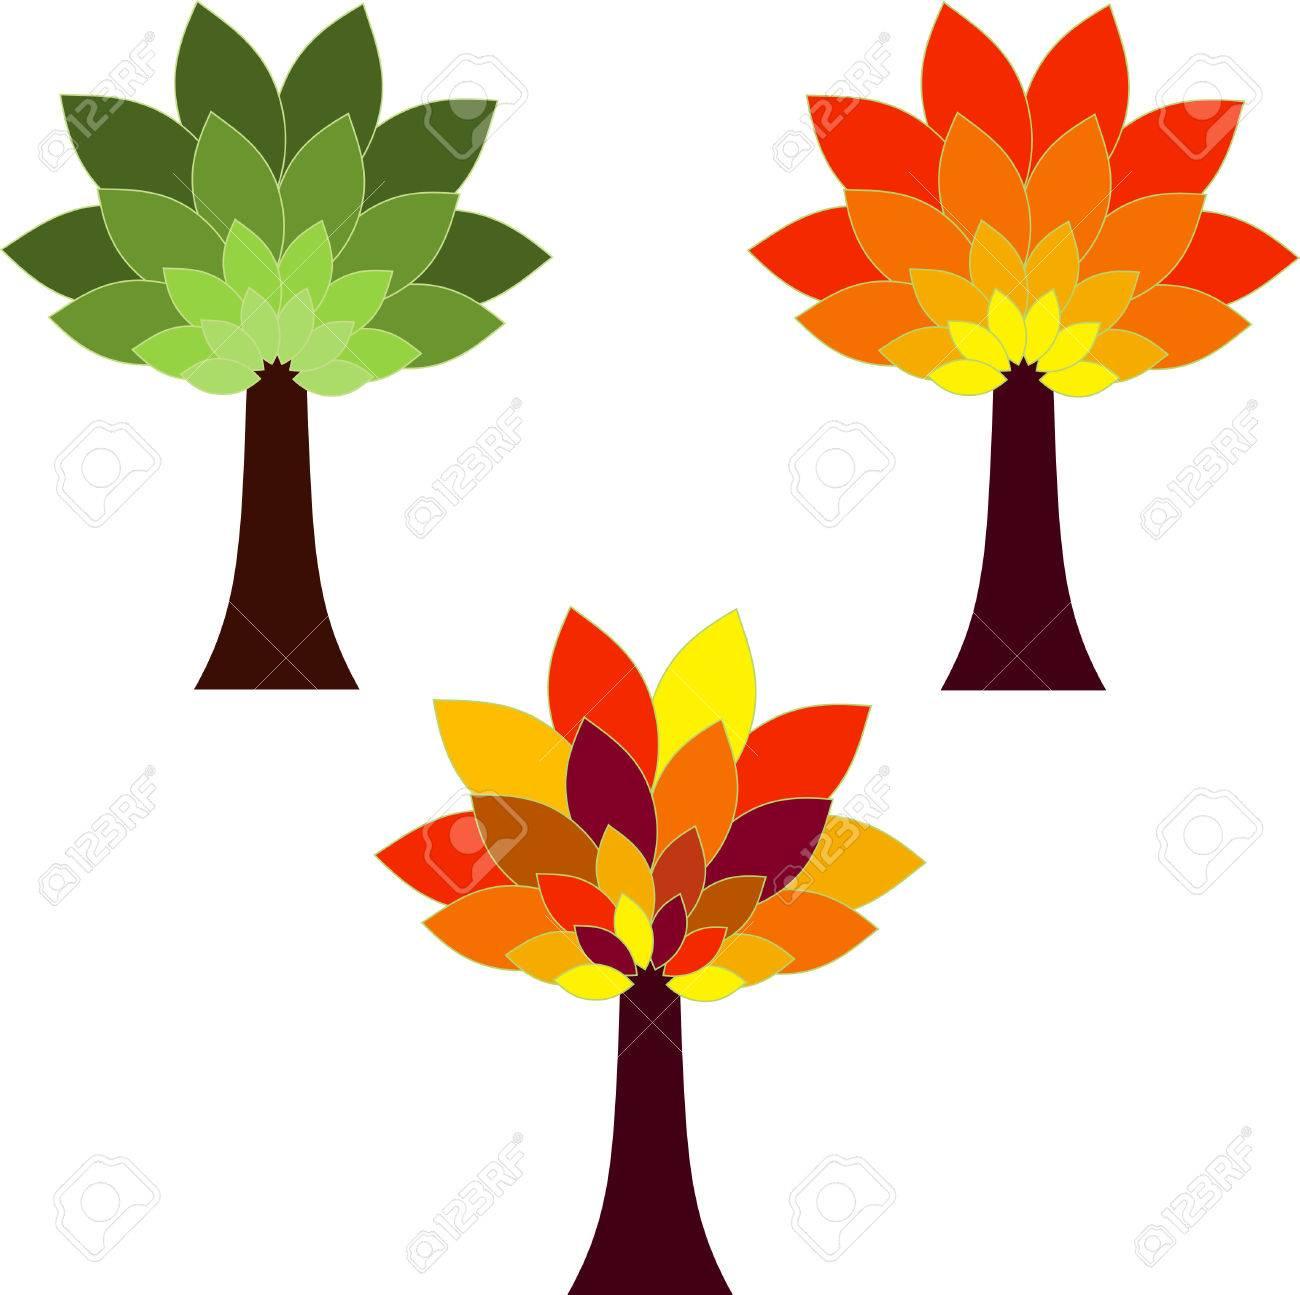 isolated tree vectors season tree illustrations royalty free rh 123rf com three vectors are shown tree vector image